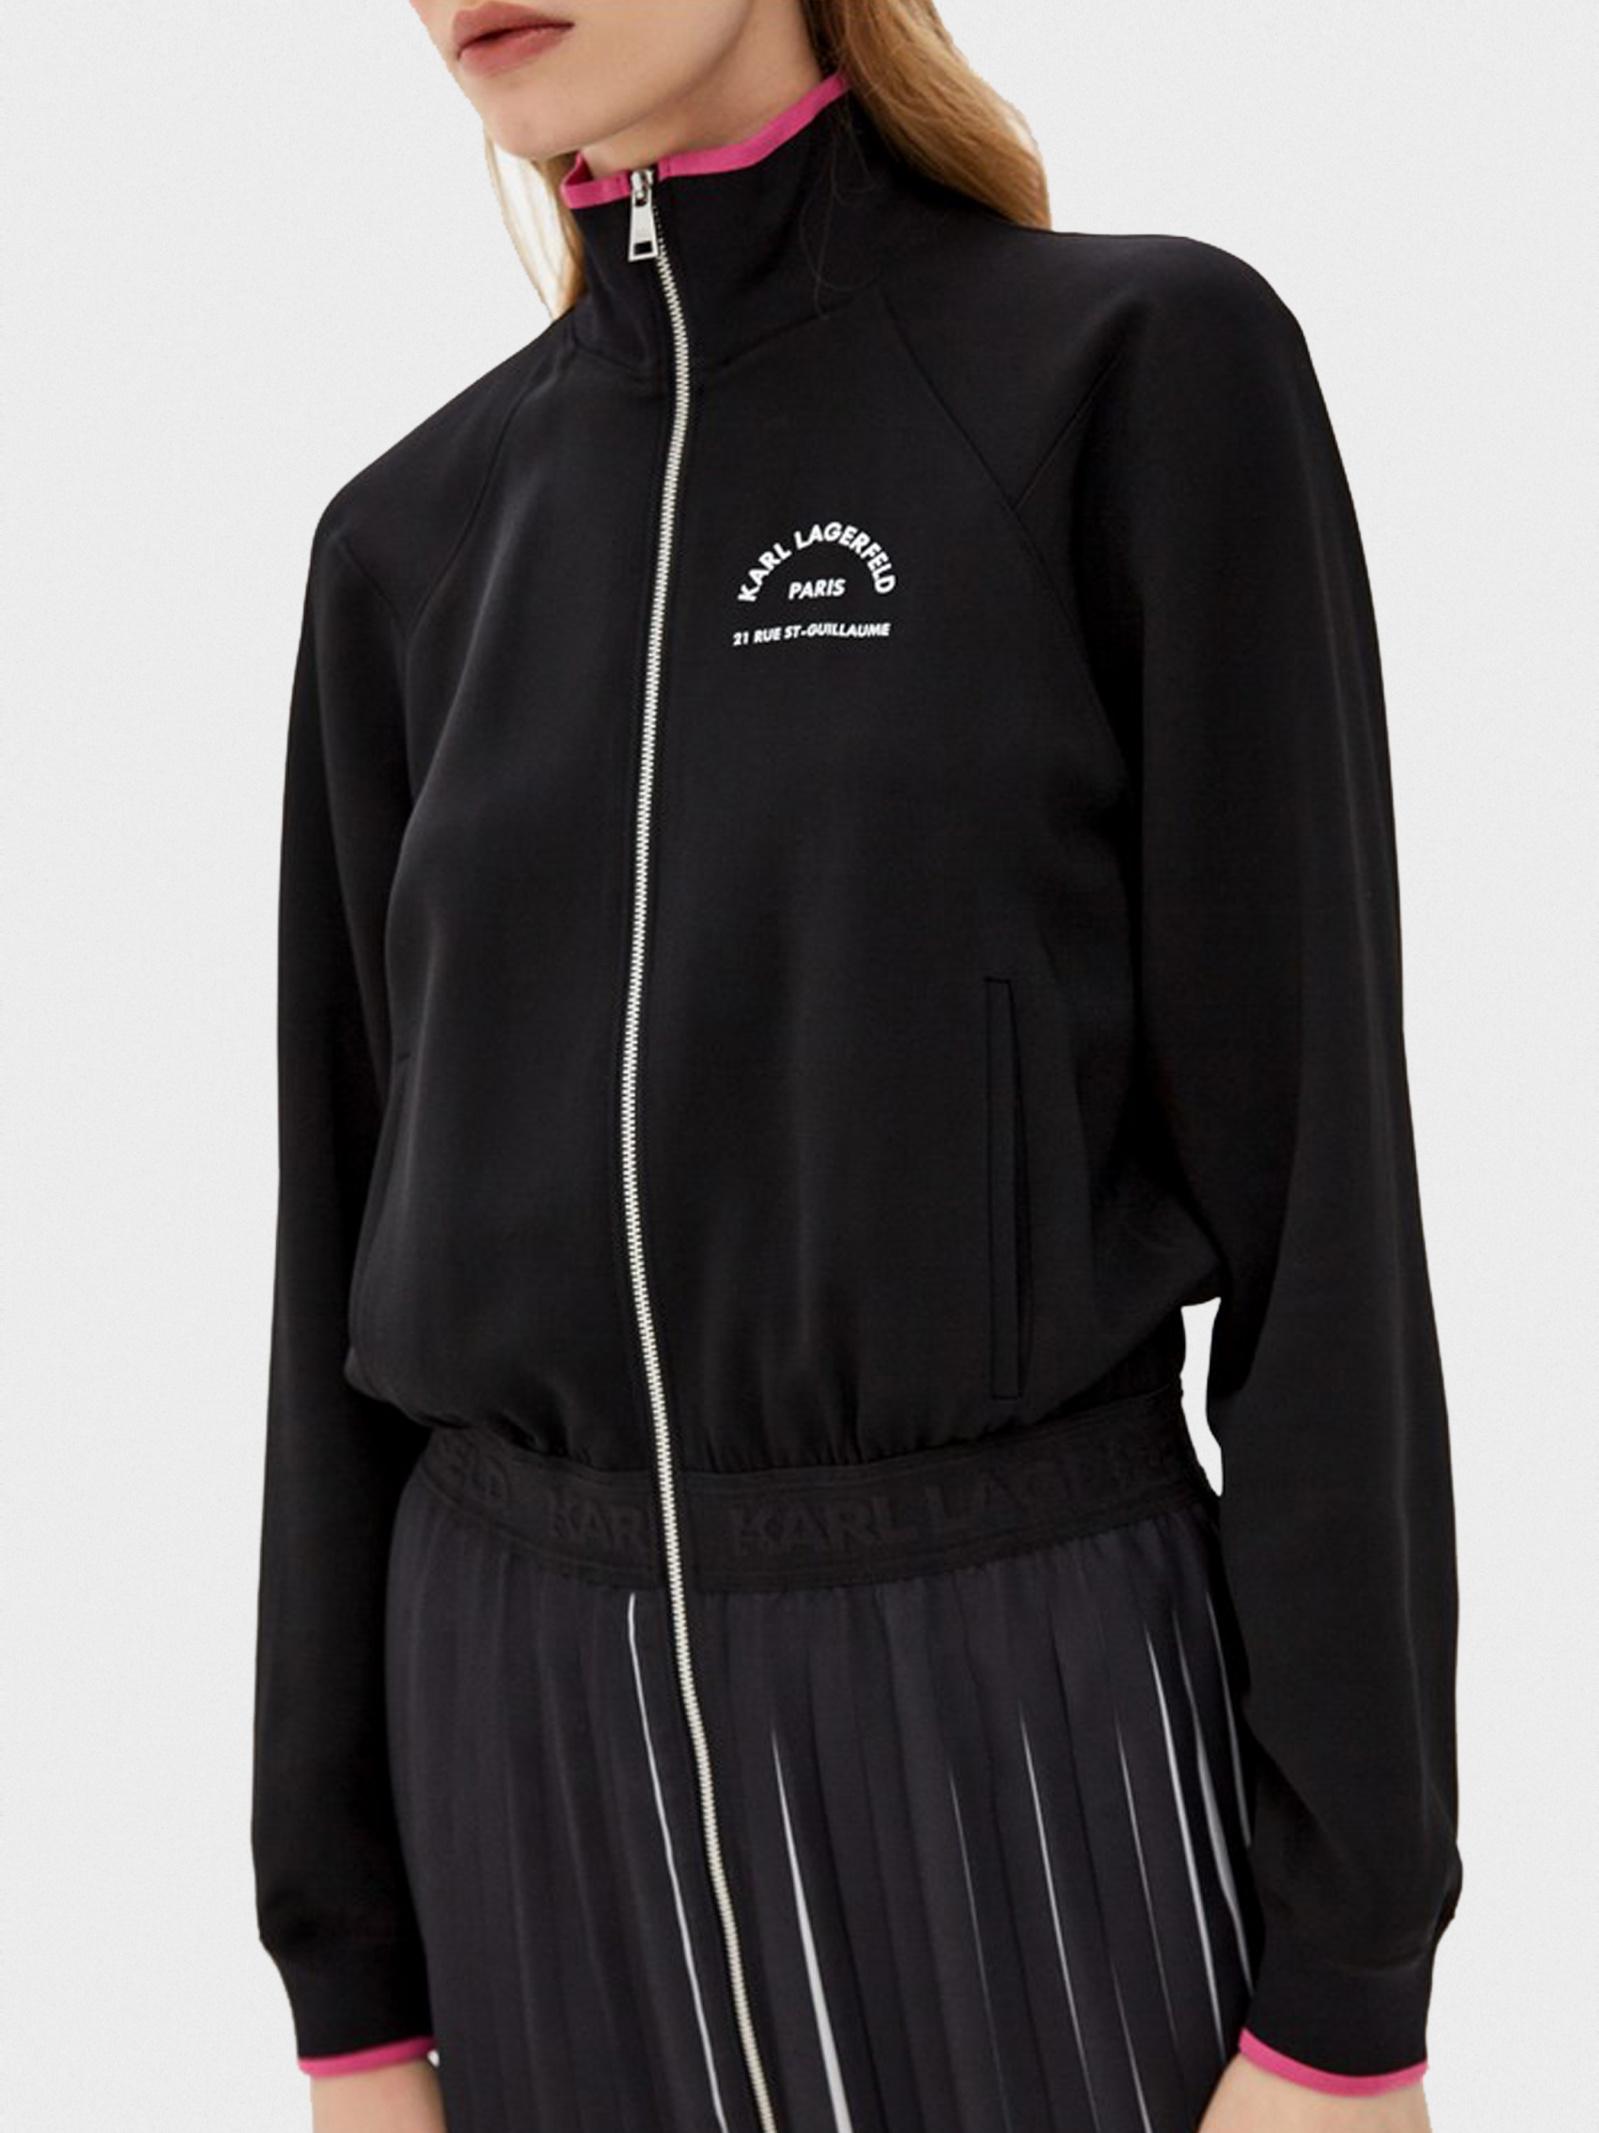 Платье женские Karl Lagerfeld модель 201W1301_999_0041 купить, 2017